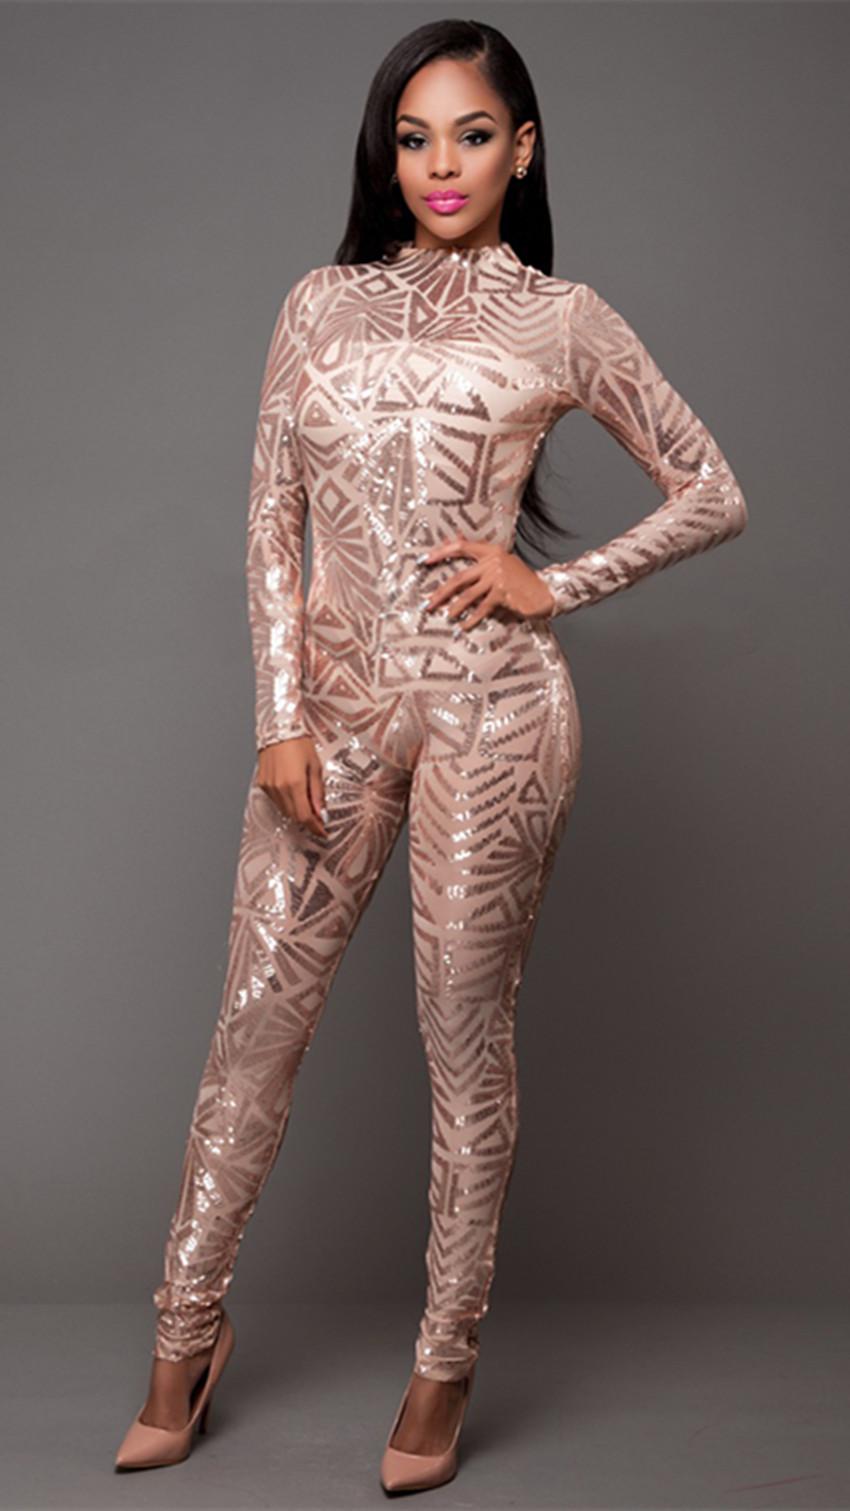 Women Sexy Sequin Jumpsuit Nude Illusion Slim Leg Pants -9263